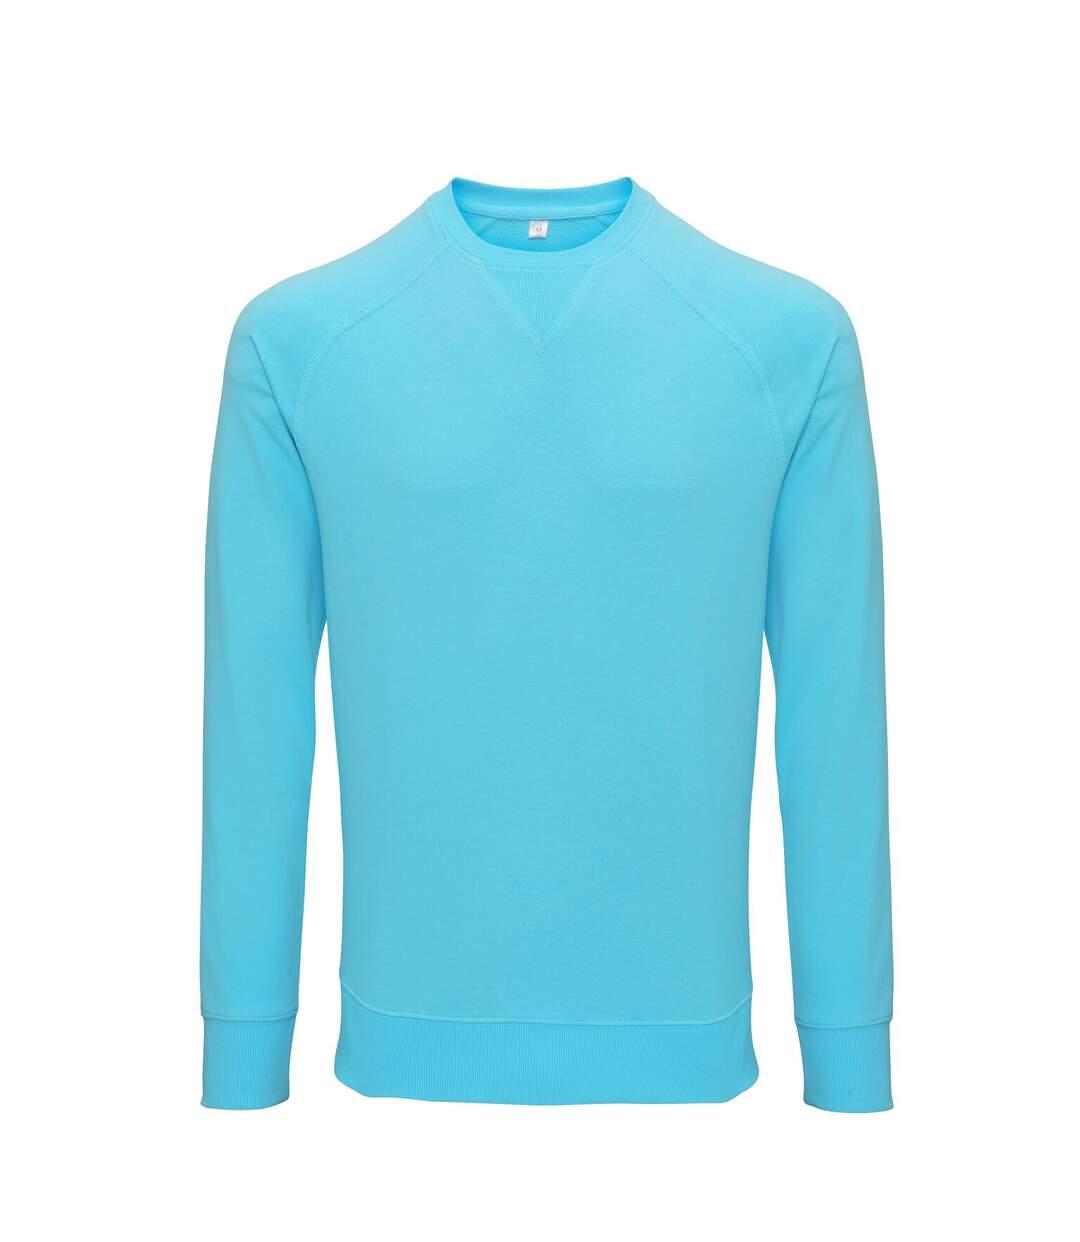 Asquith & Fox Mens Coastal Vintage Wash Loop Back Sweatshirt (Bright Ocean) - UTRW6240